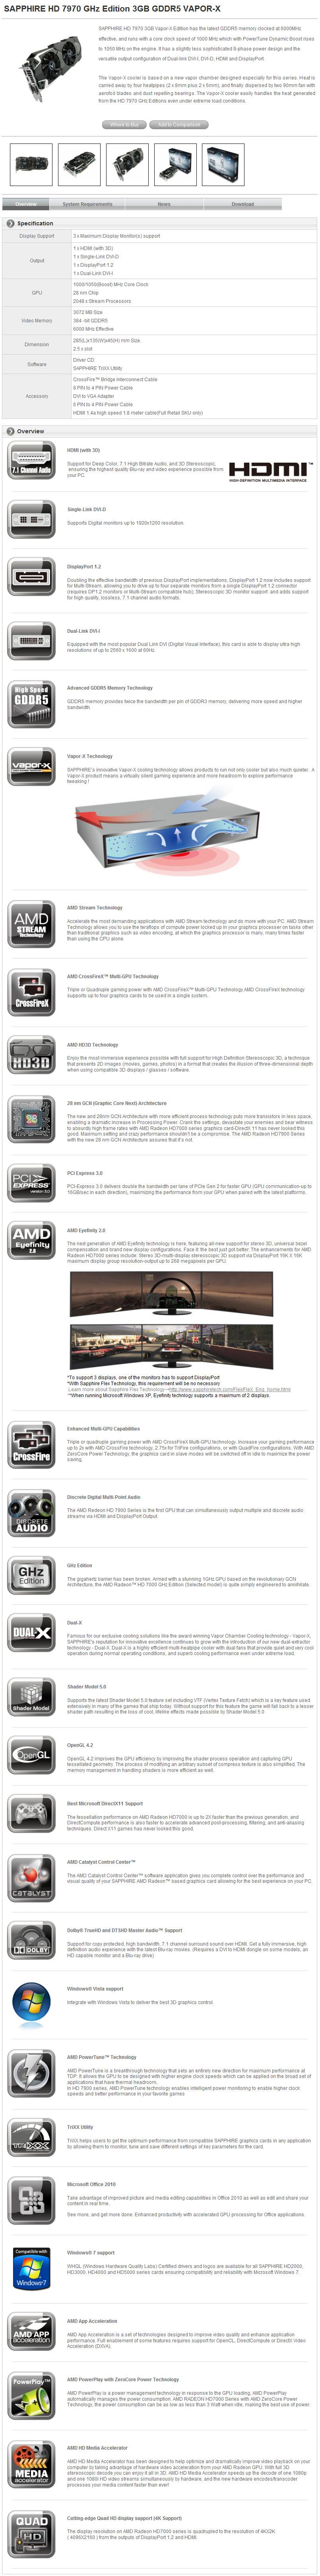 9 17 2013 10 27 48 pm SAPPHIRE HD 7970 GHz Edition 3GB GDDR5 VAPOR X Review